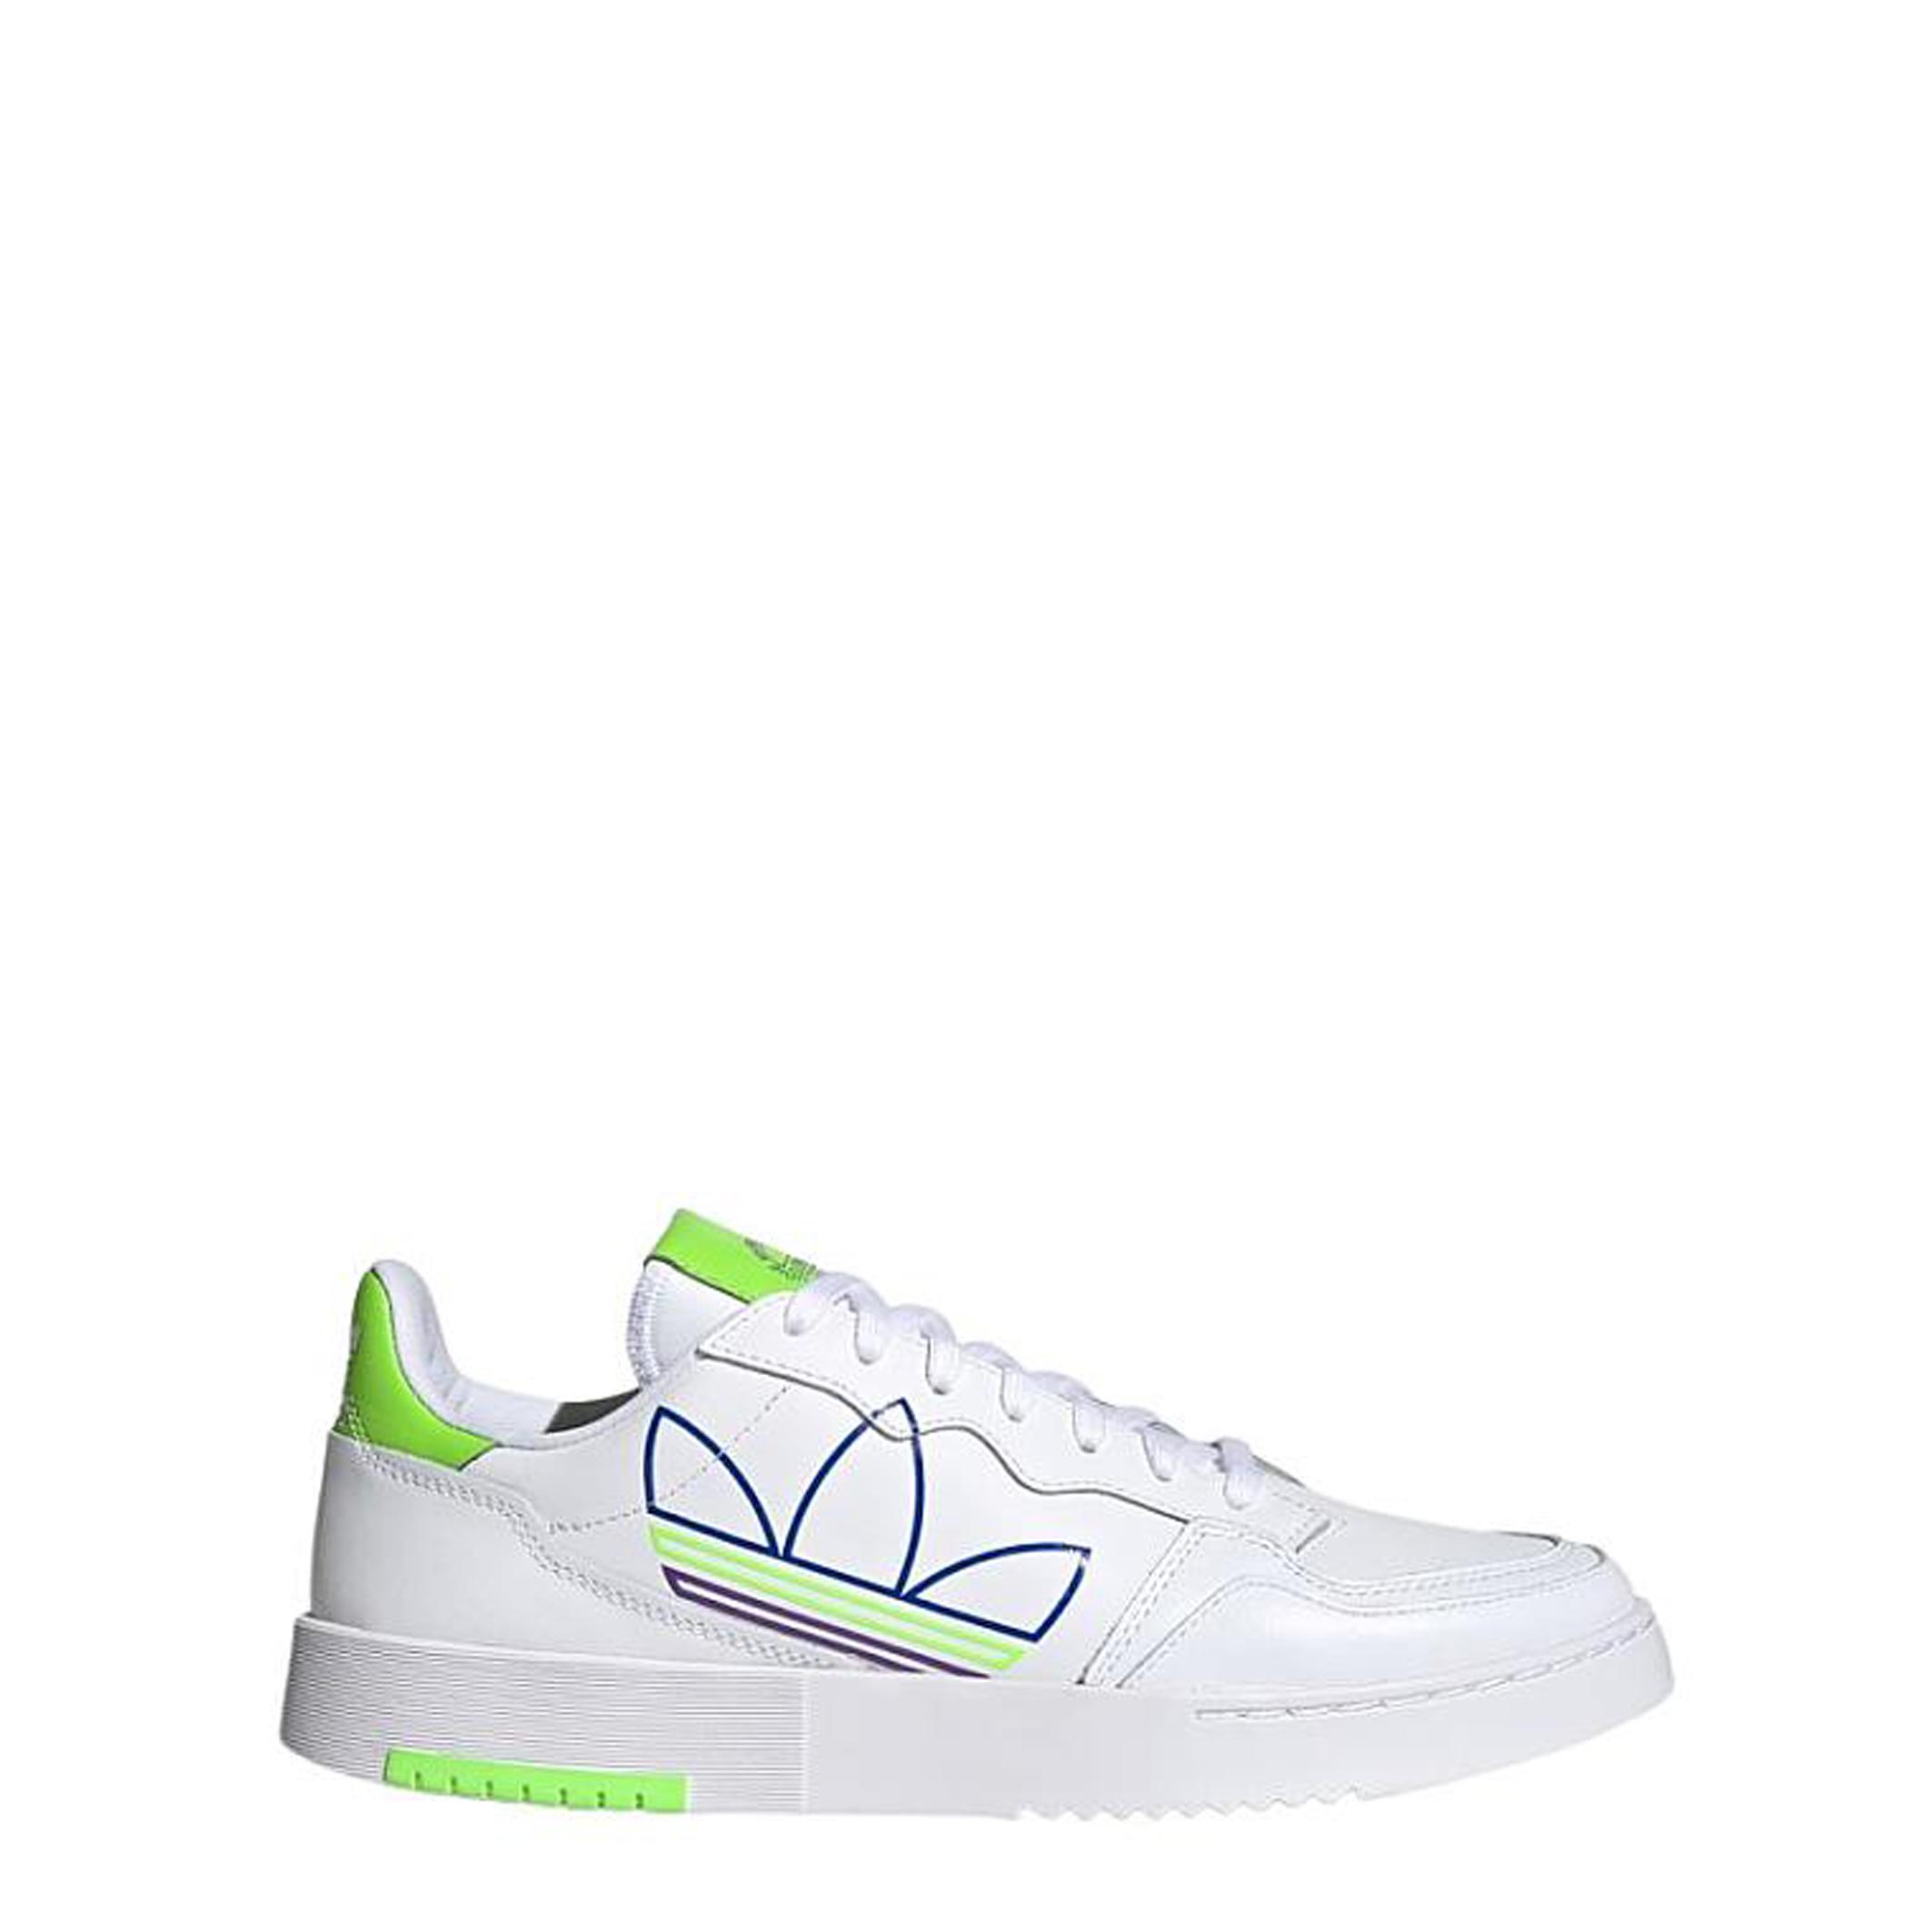 Adidas - Supercourt - White